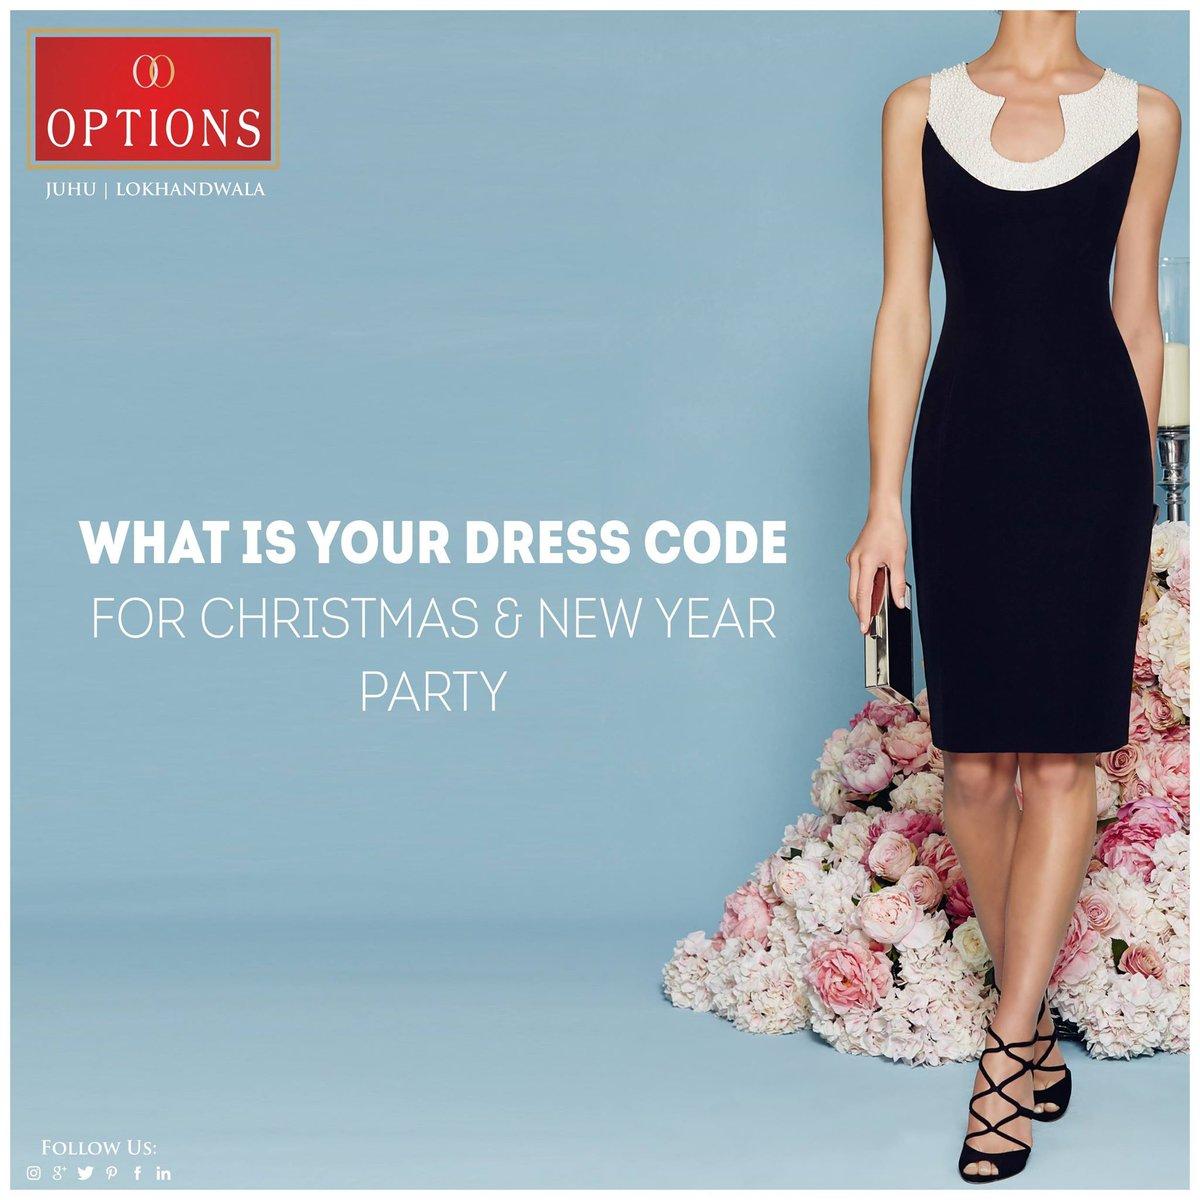 Dorable Dress Code For Christmas Party Model - All Wedding Dresses ...